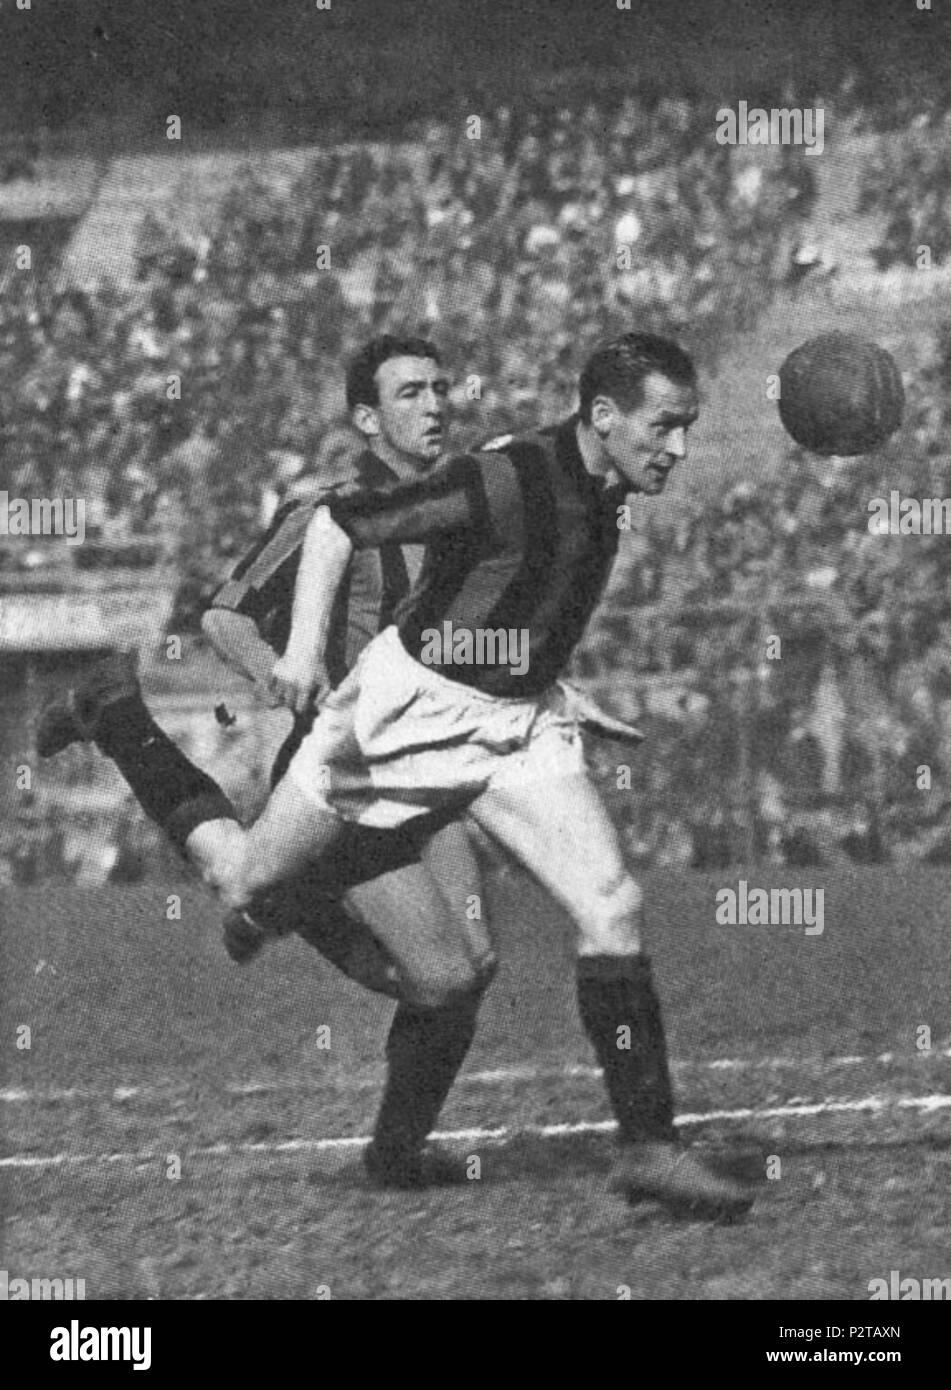 . Italiano: Il calciatore svedese Nils Liedholm dans azione al Milan. Entre 1949 et 1961. Inconnu 3 AC Milan - Nils Liedholm Photo Stock